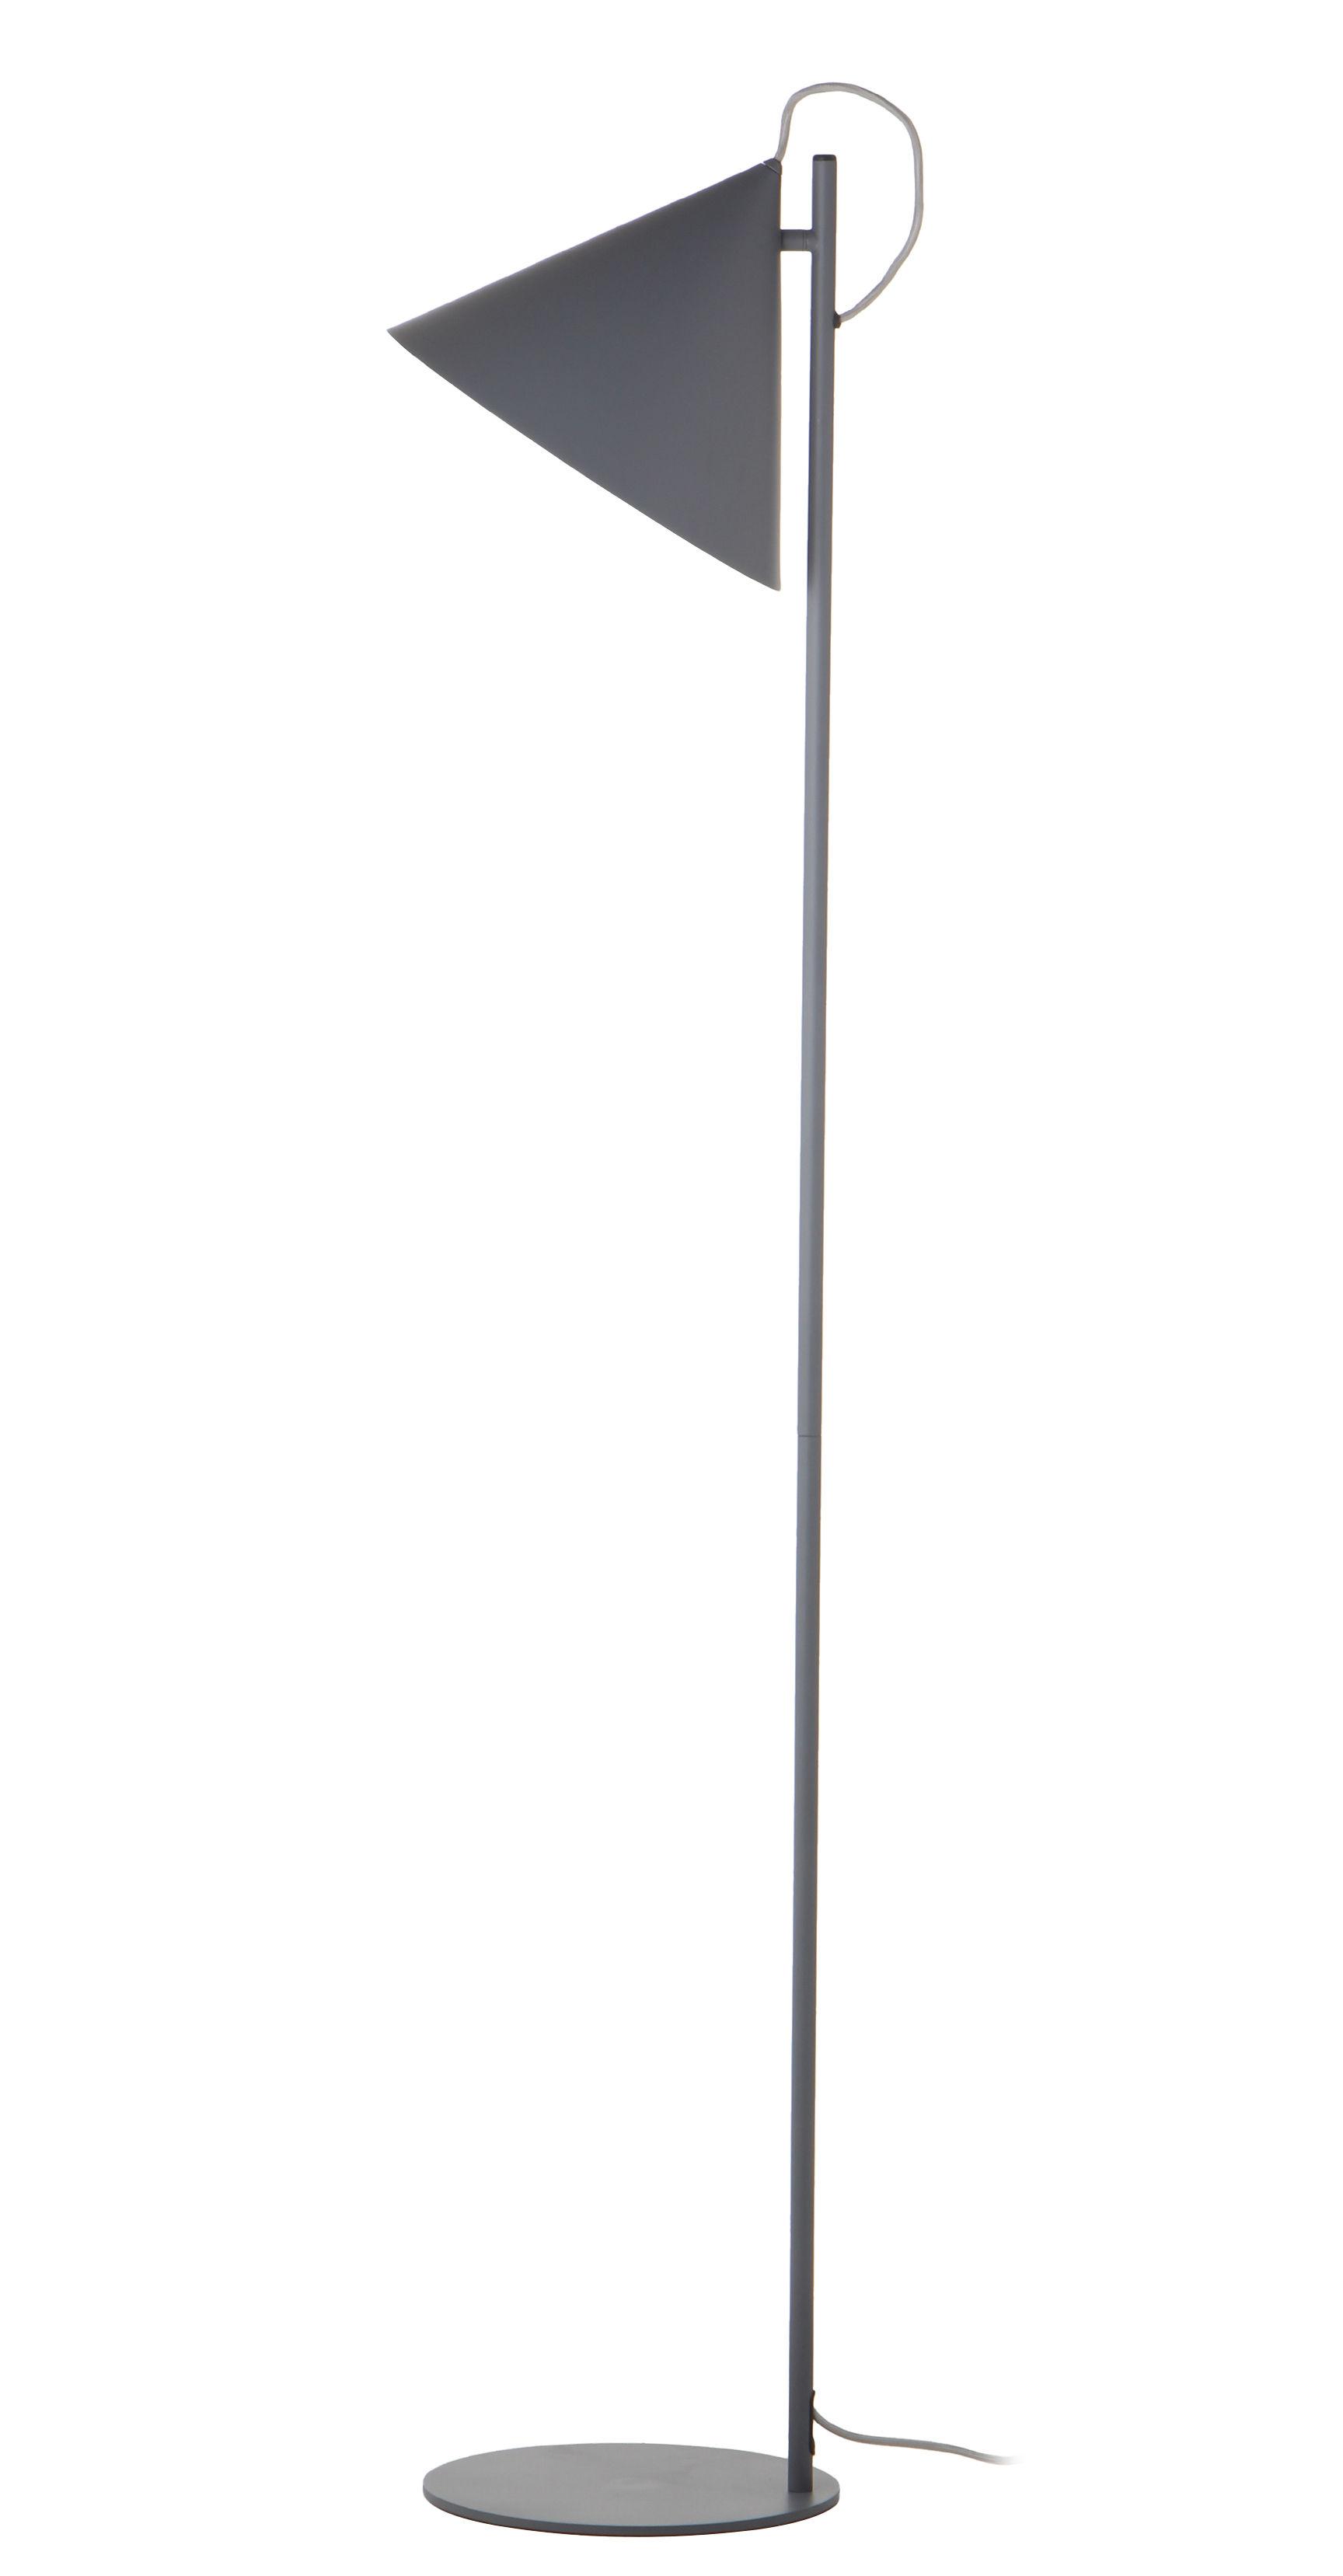 Luminaire - Lampadaires - Lampadaire Benjamin / H 152 cm - Frandsen - Gris mat - Métal peint